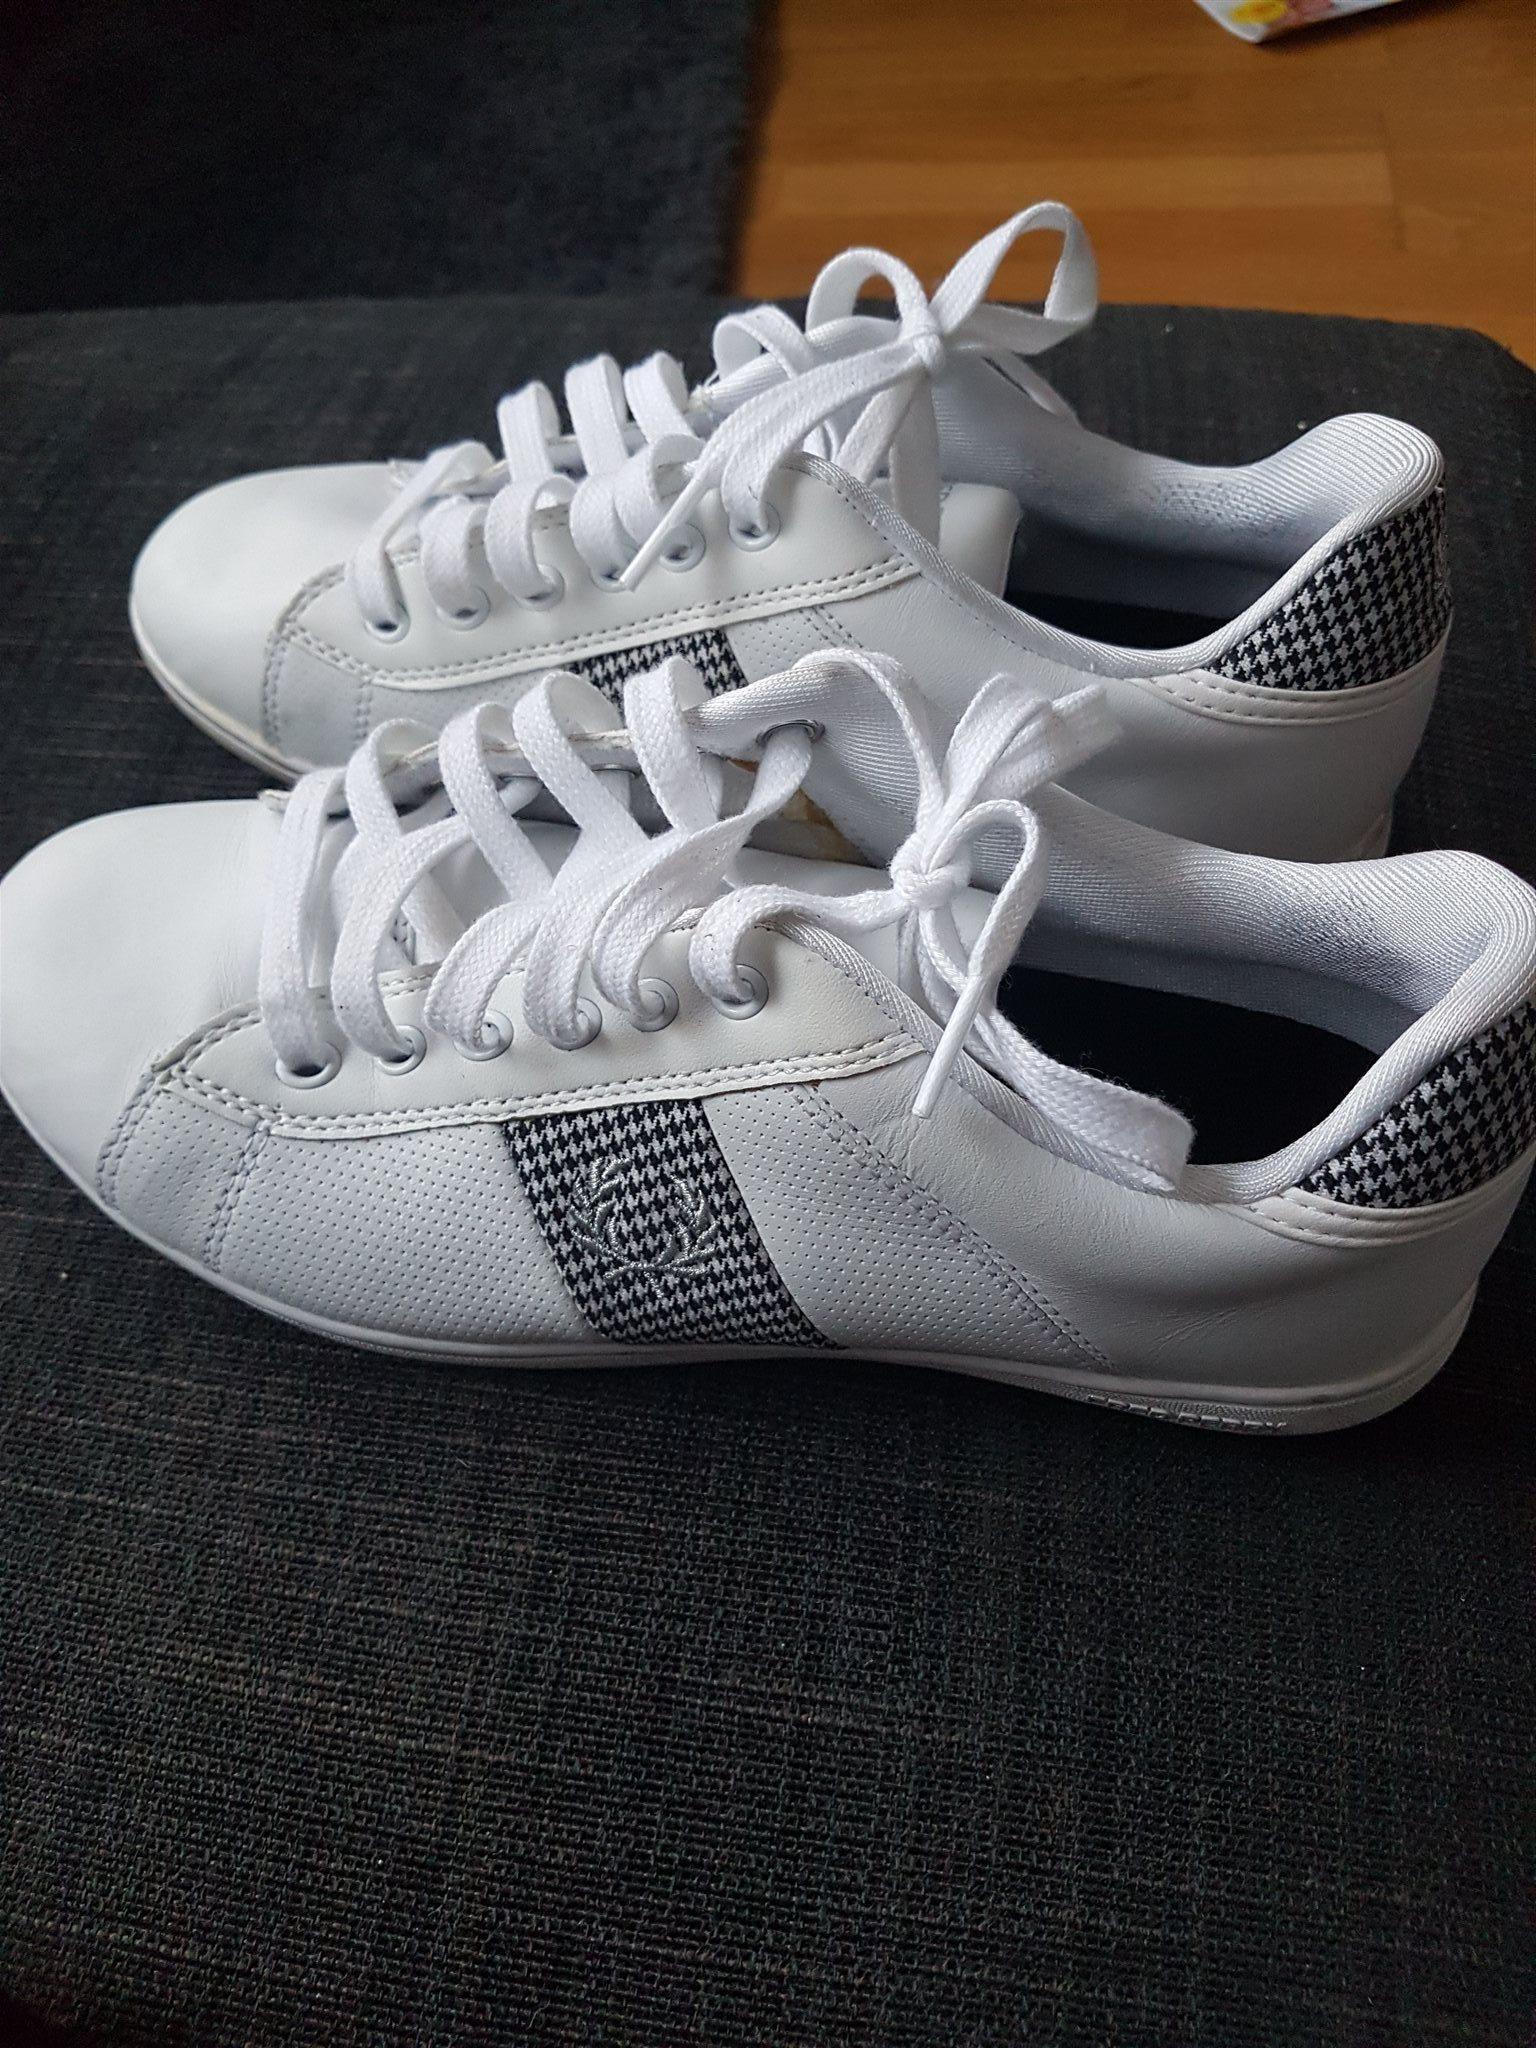 Sneakers Fred Perry mkt bra skick att 38 (341559952) ᐈ Köp på Tradera 78e6a611a5ce1